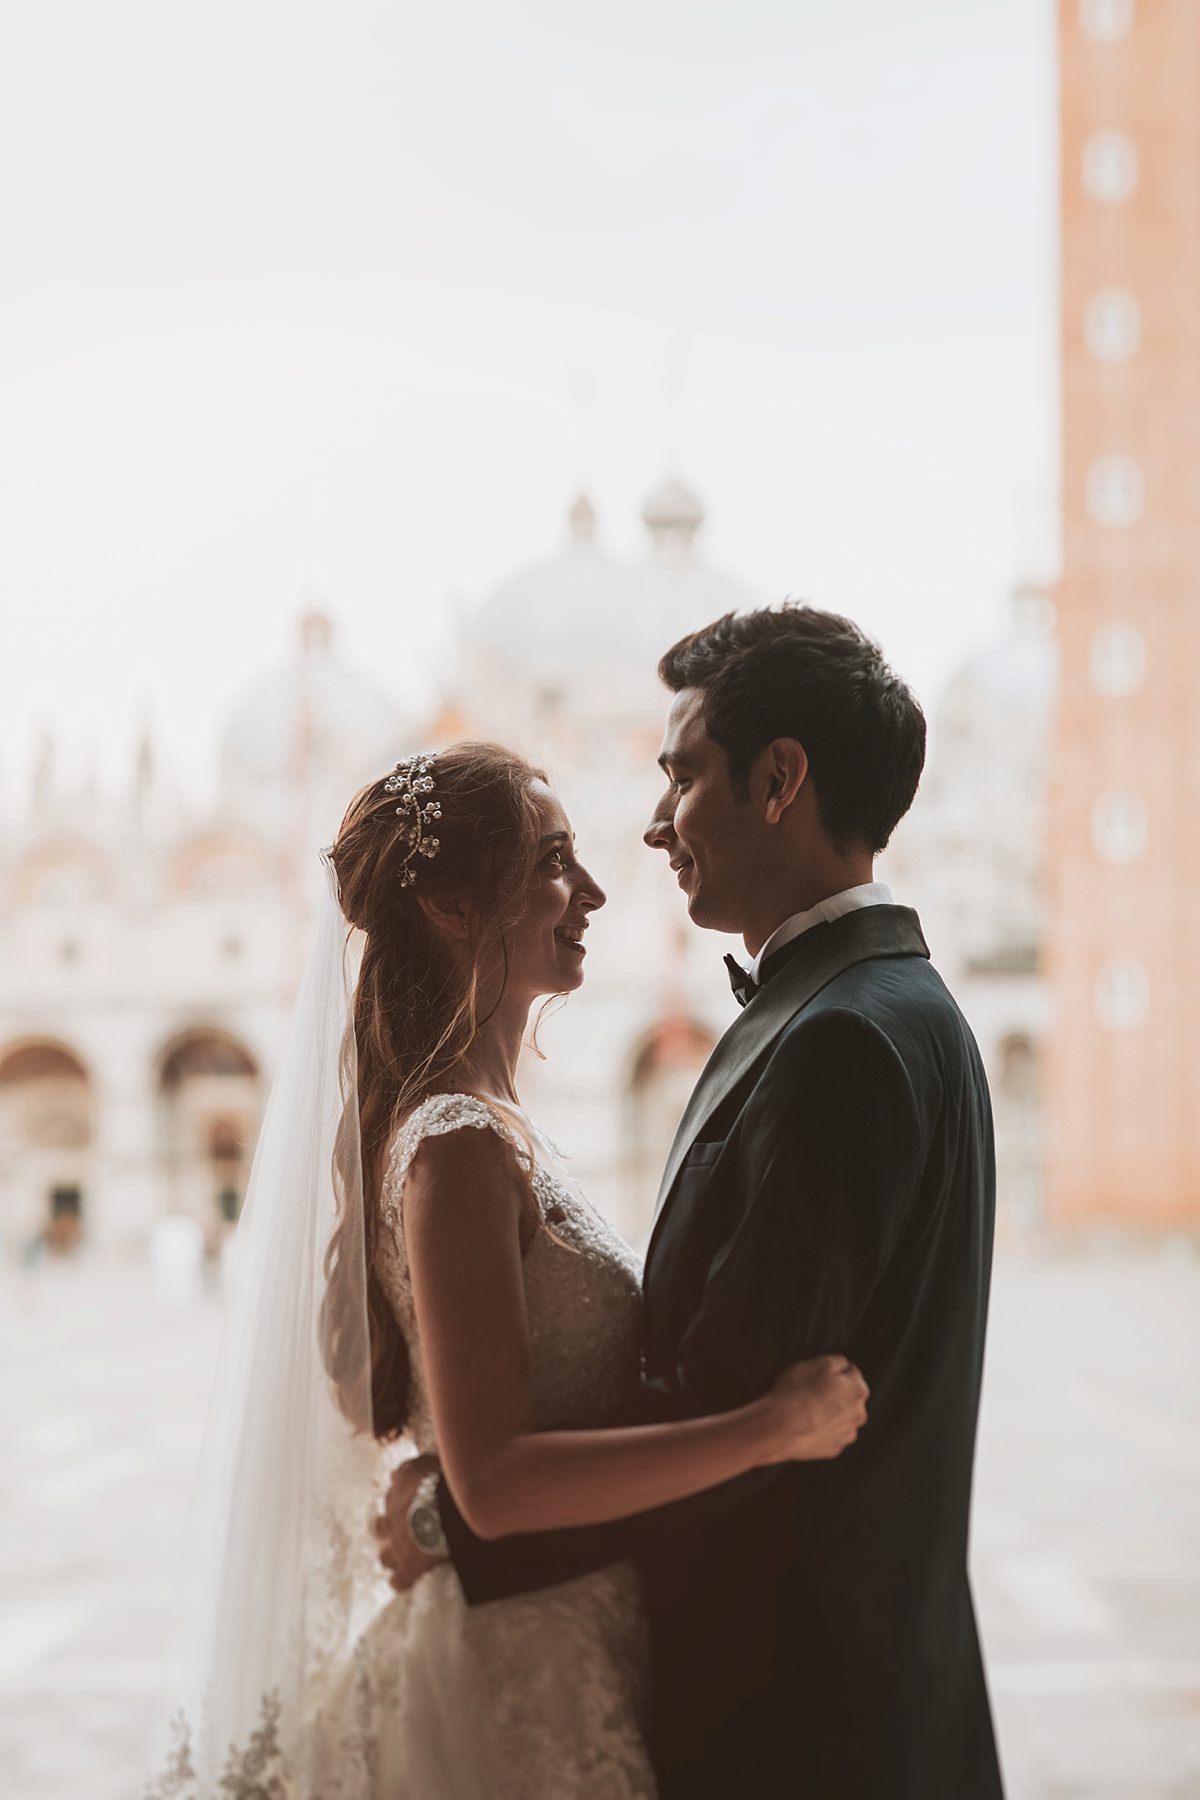 romantica-luna-di-miele-a-venezia_0007